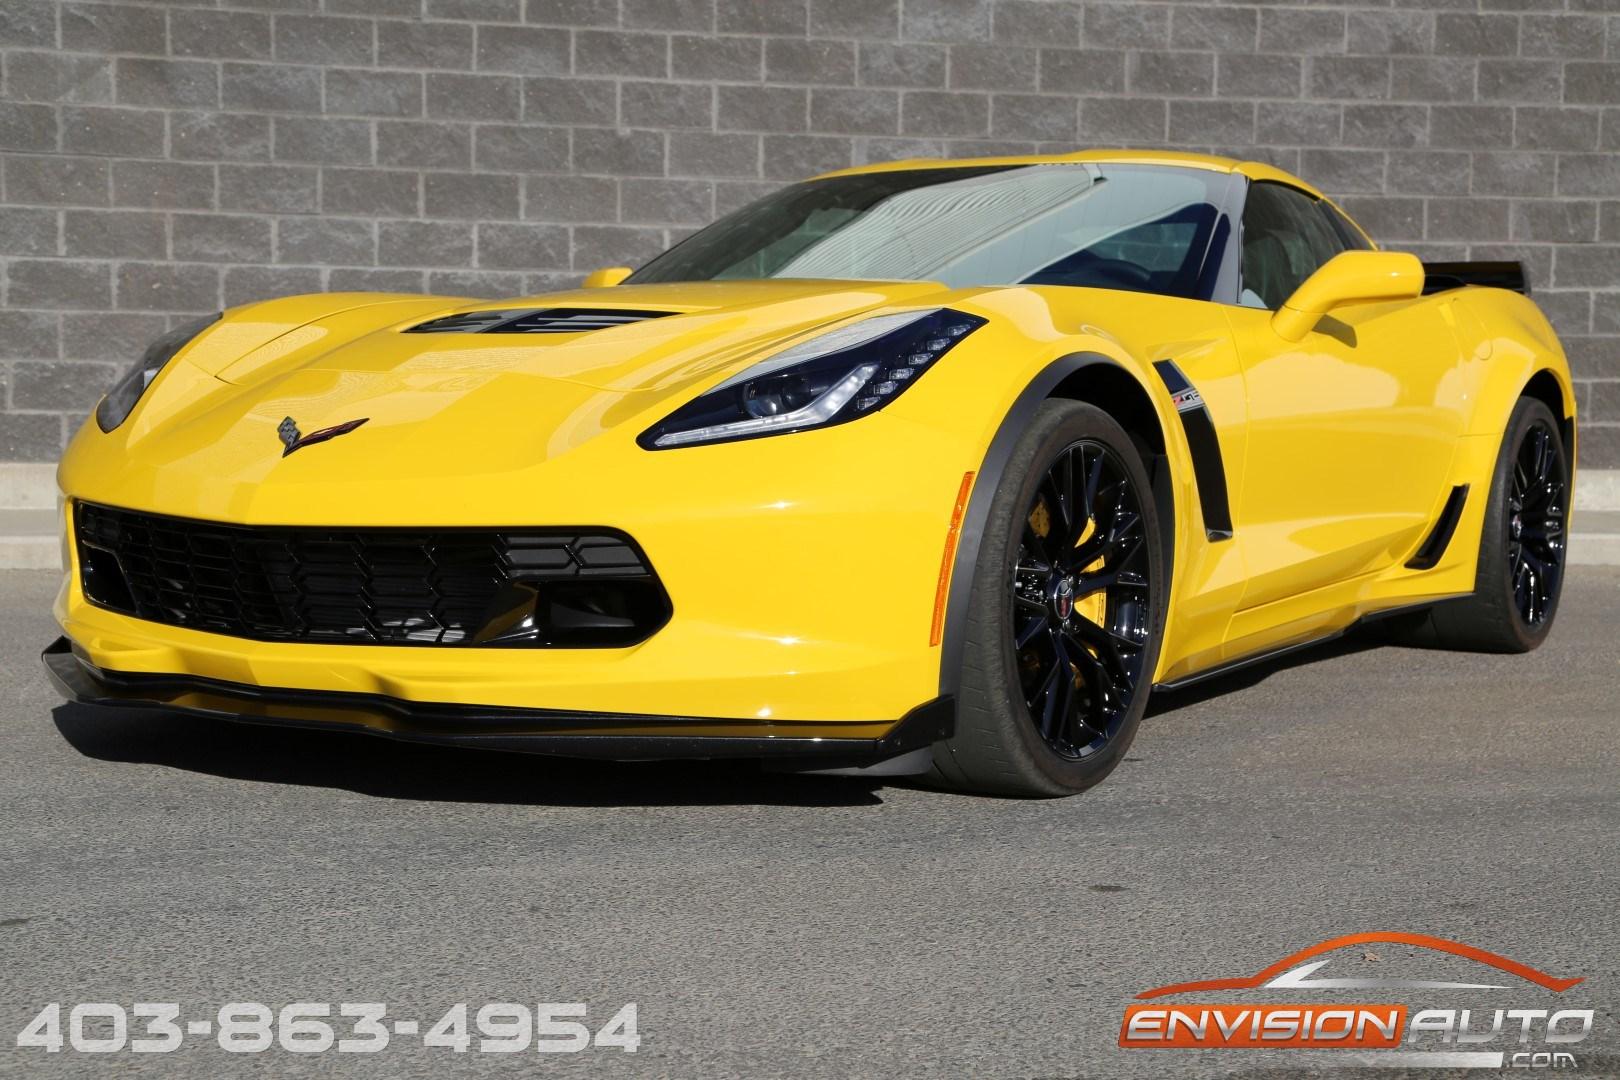 2016 Corvette Z07 >> 2015 Chevrolet Corvette Z06 – 3LZ – Z07 – Carbon Ceramics – Aero - Envision Auto